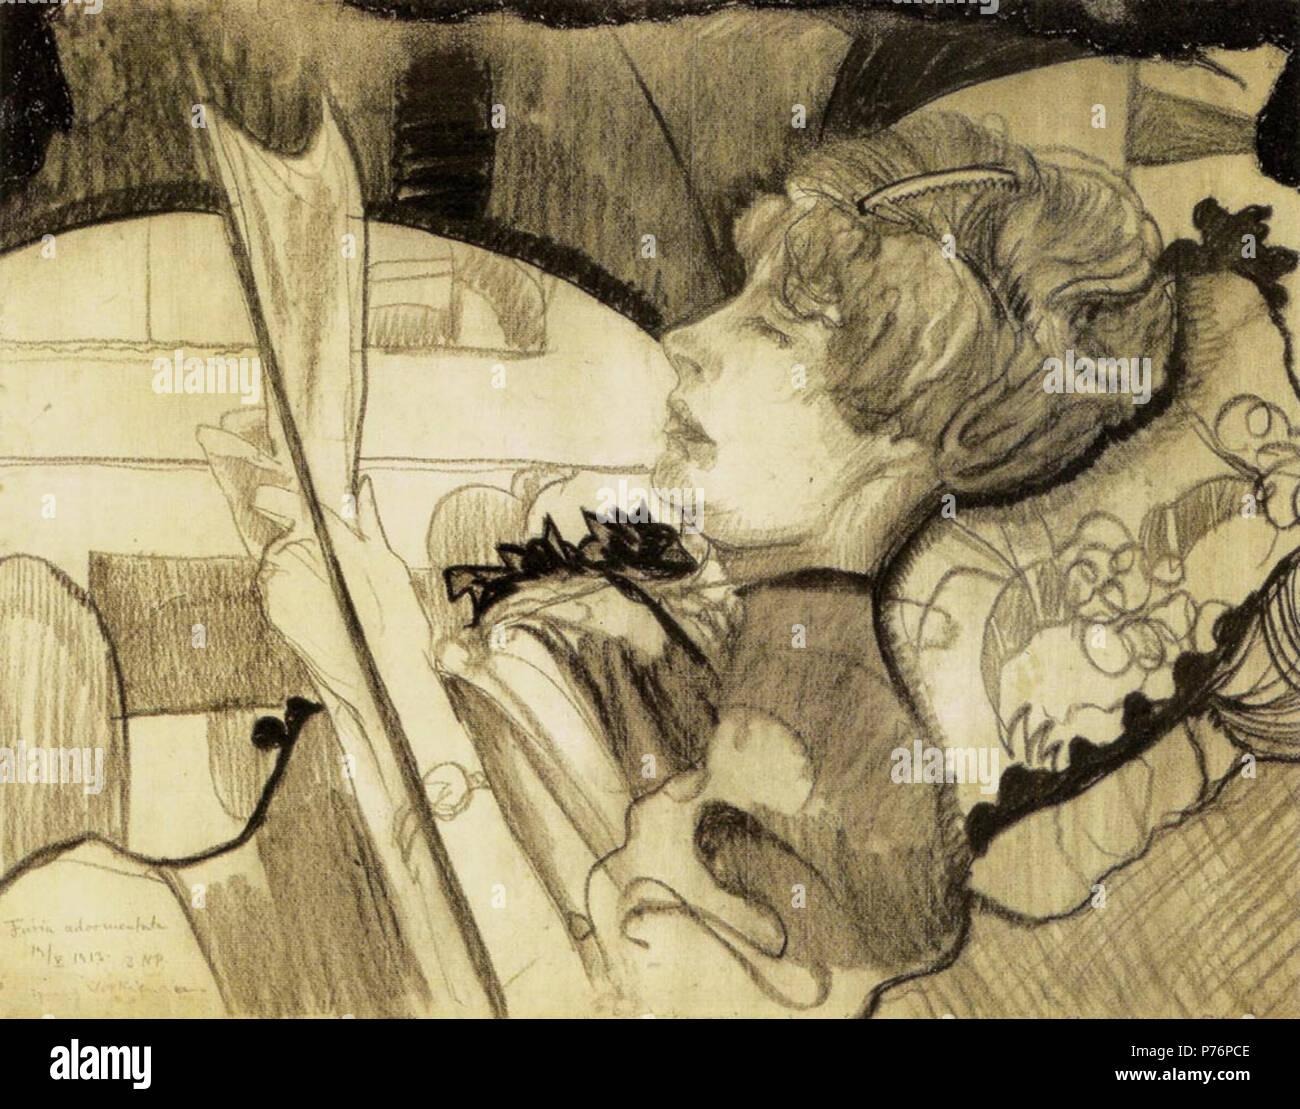 Polski: 'Adormentata wgiel Furia', na papierze, 48 x 63 cm, Muzeum Sztuki, ód . 19133 Witkacy-Furia Adormentata Banque D'Images